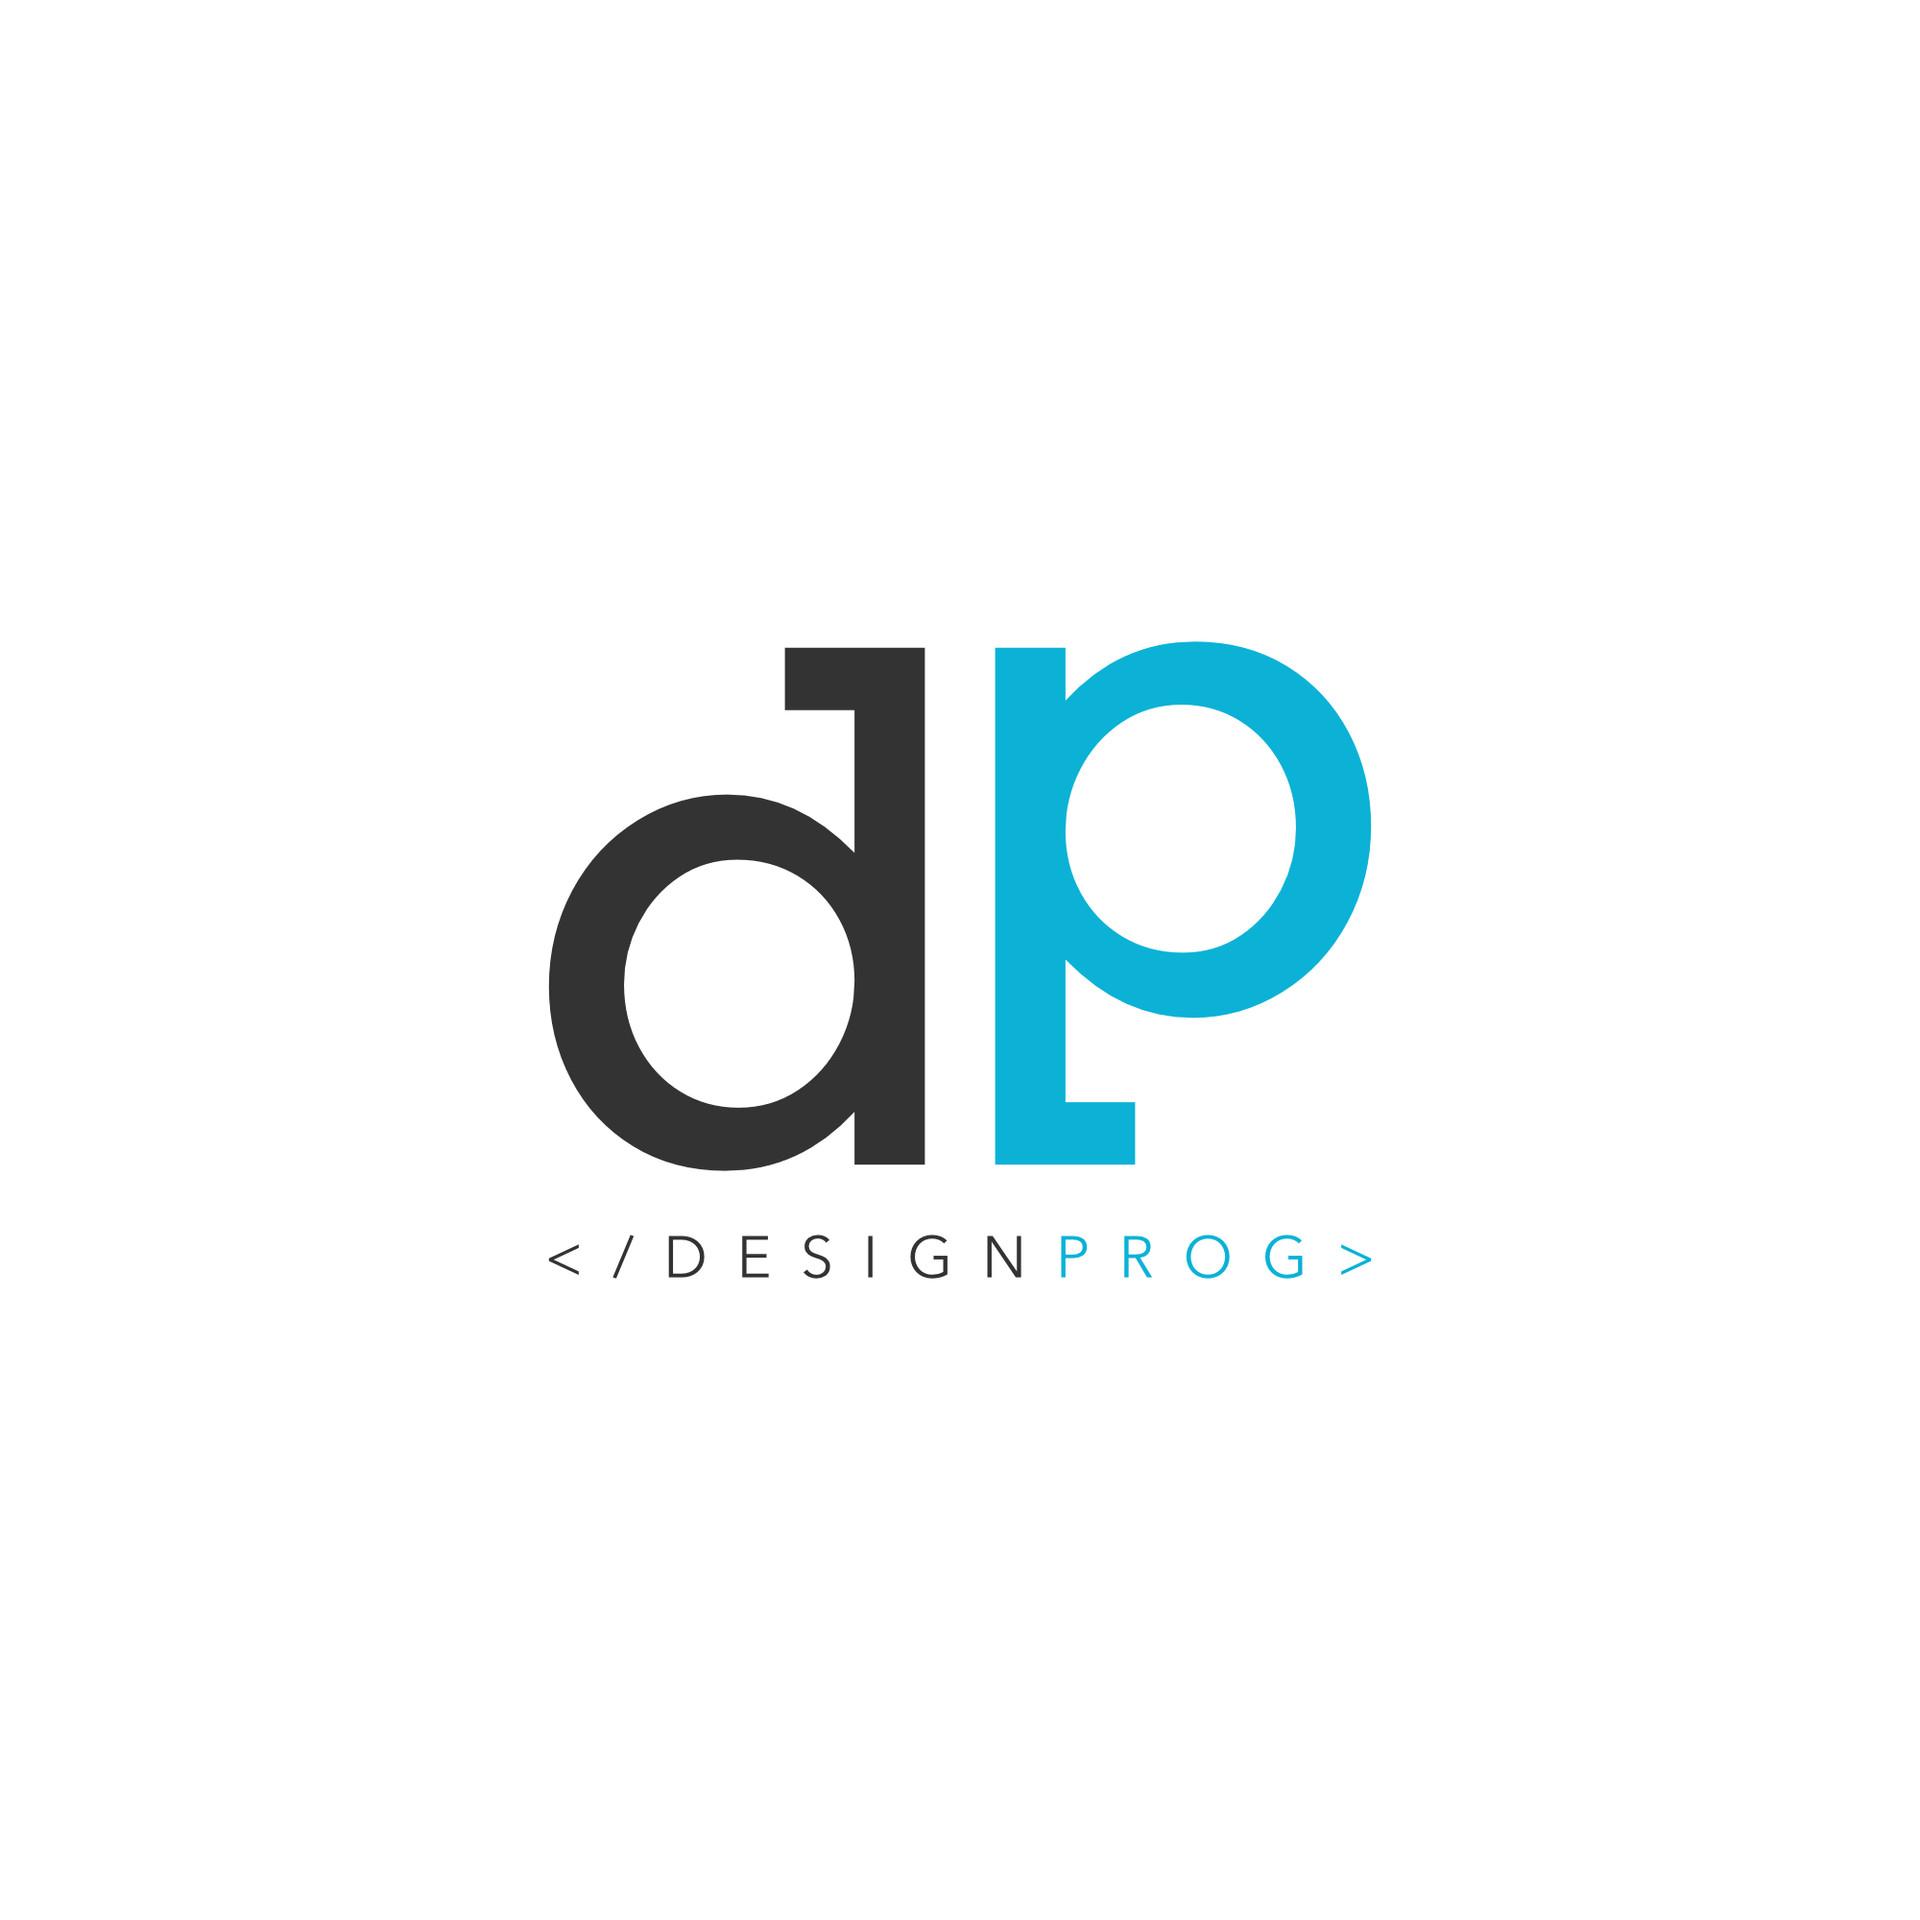 Design Prog